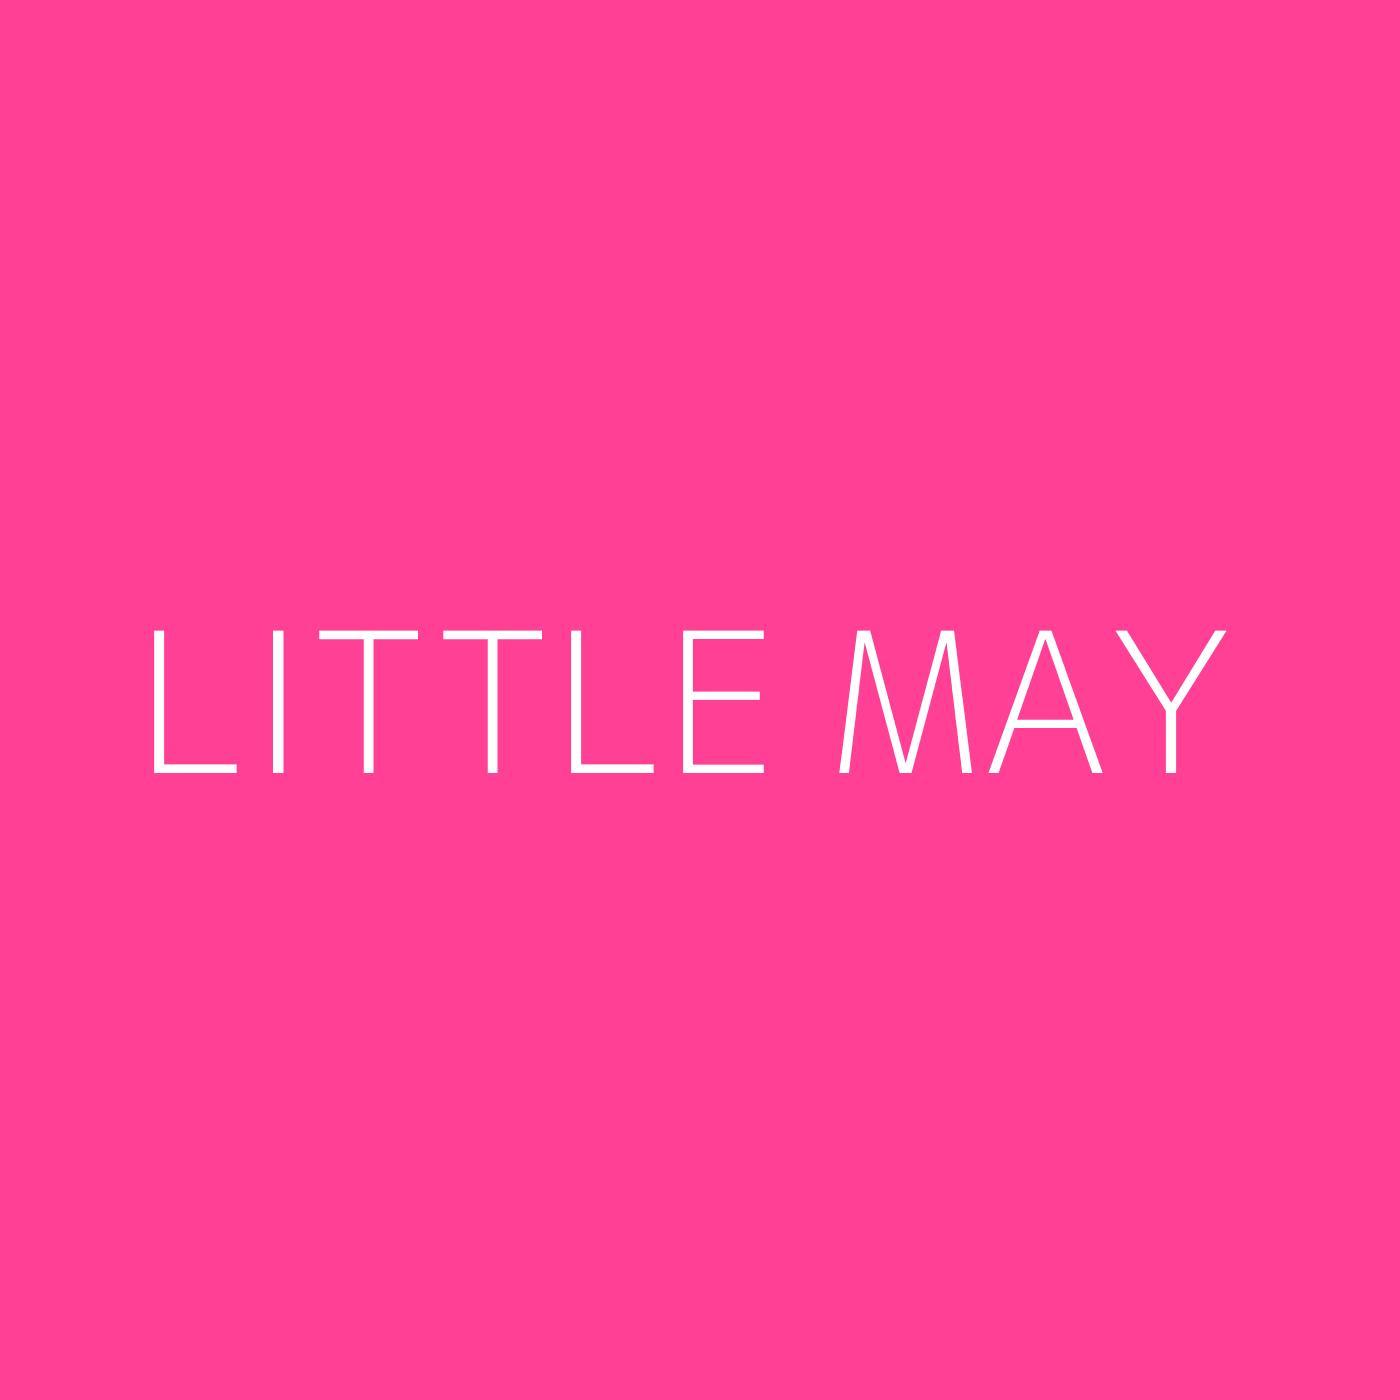 Little May Playlist Artwork